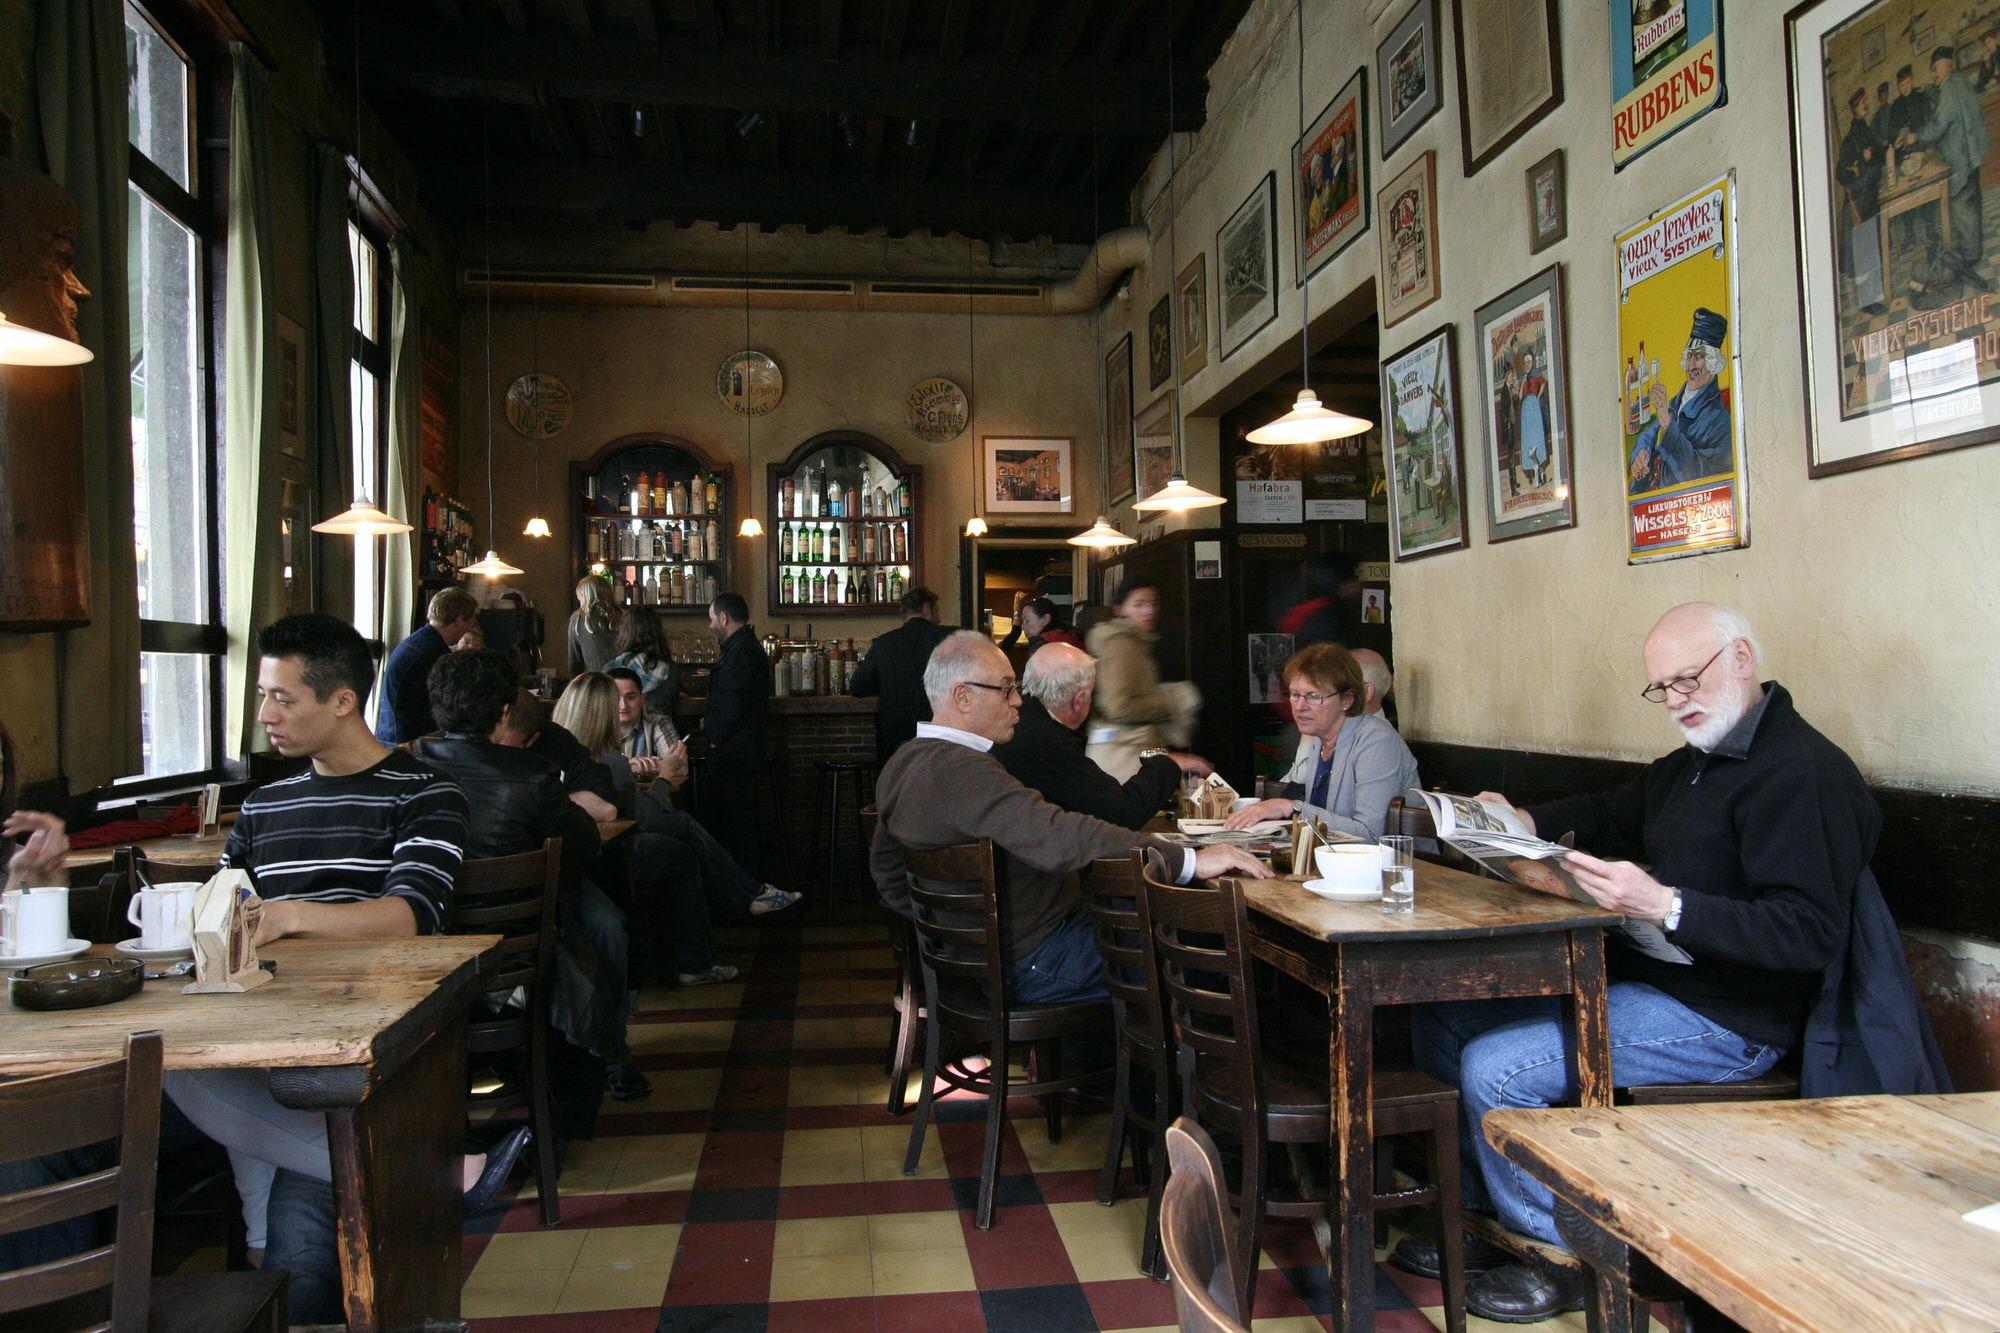 Jenever cafe De Vagant on Reyndersstraat, Antwerp